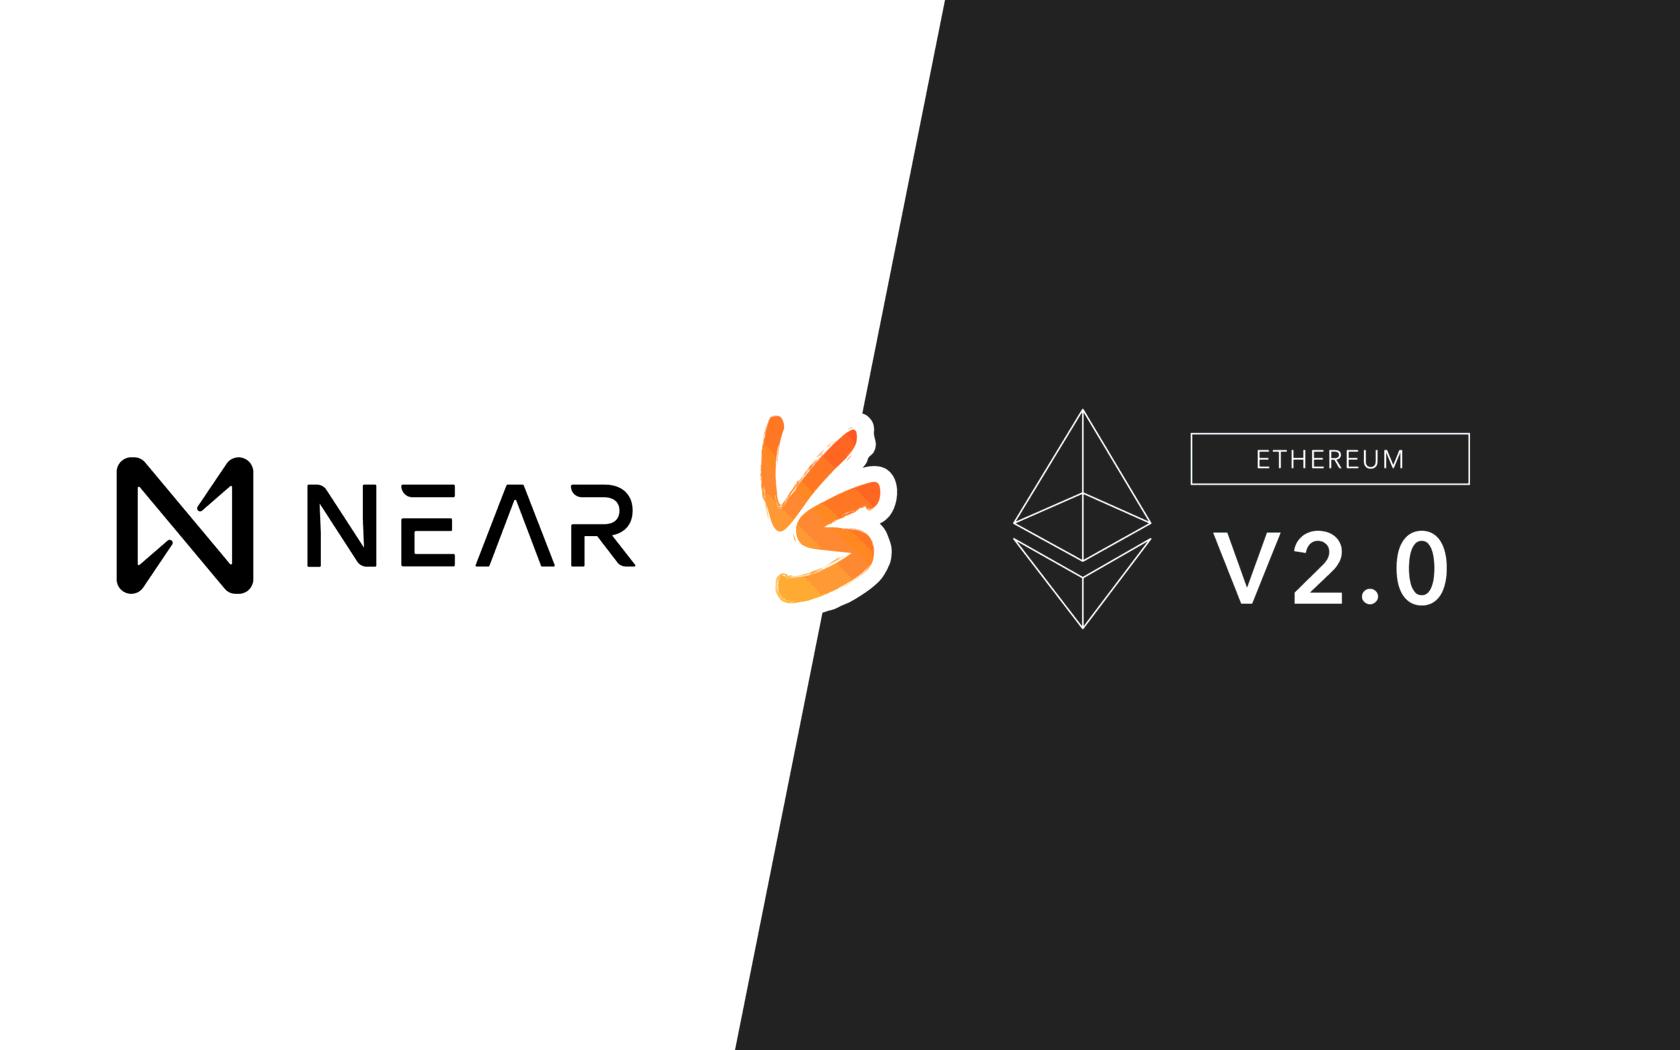 ethereum vs near cover